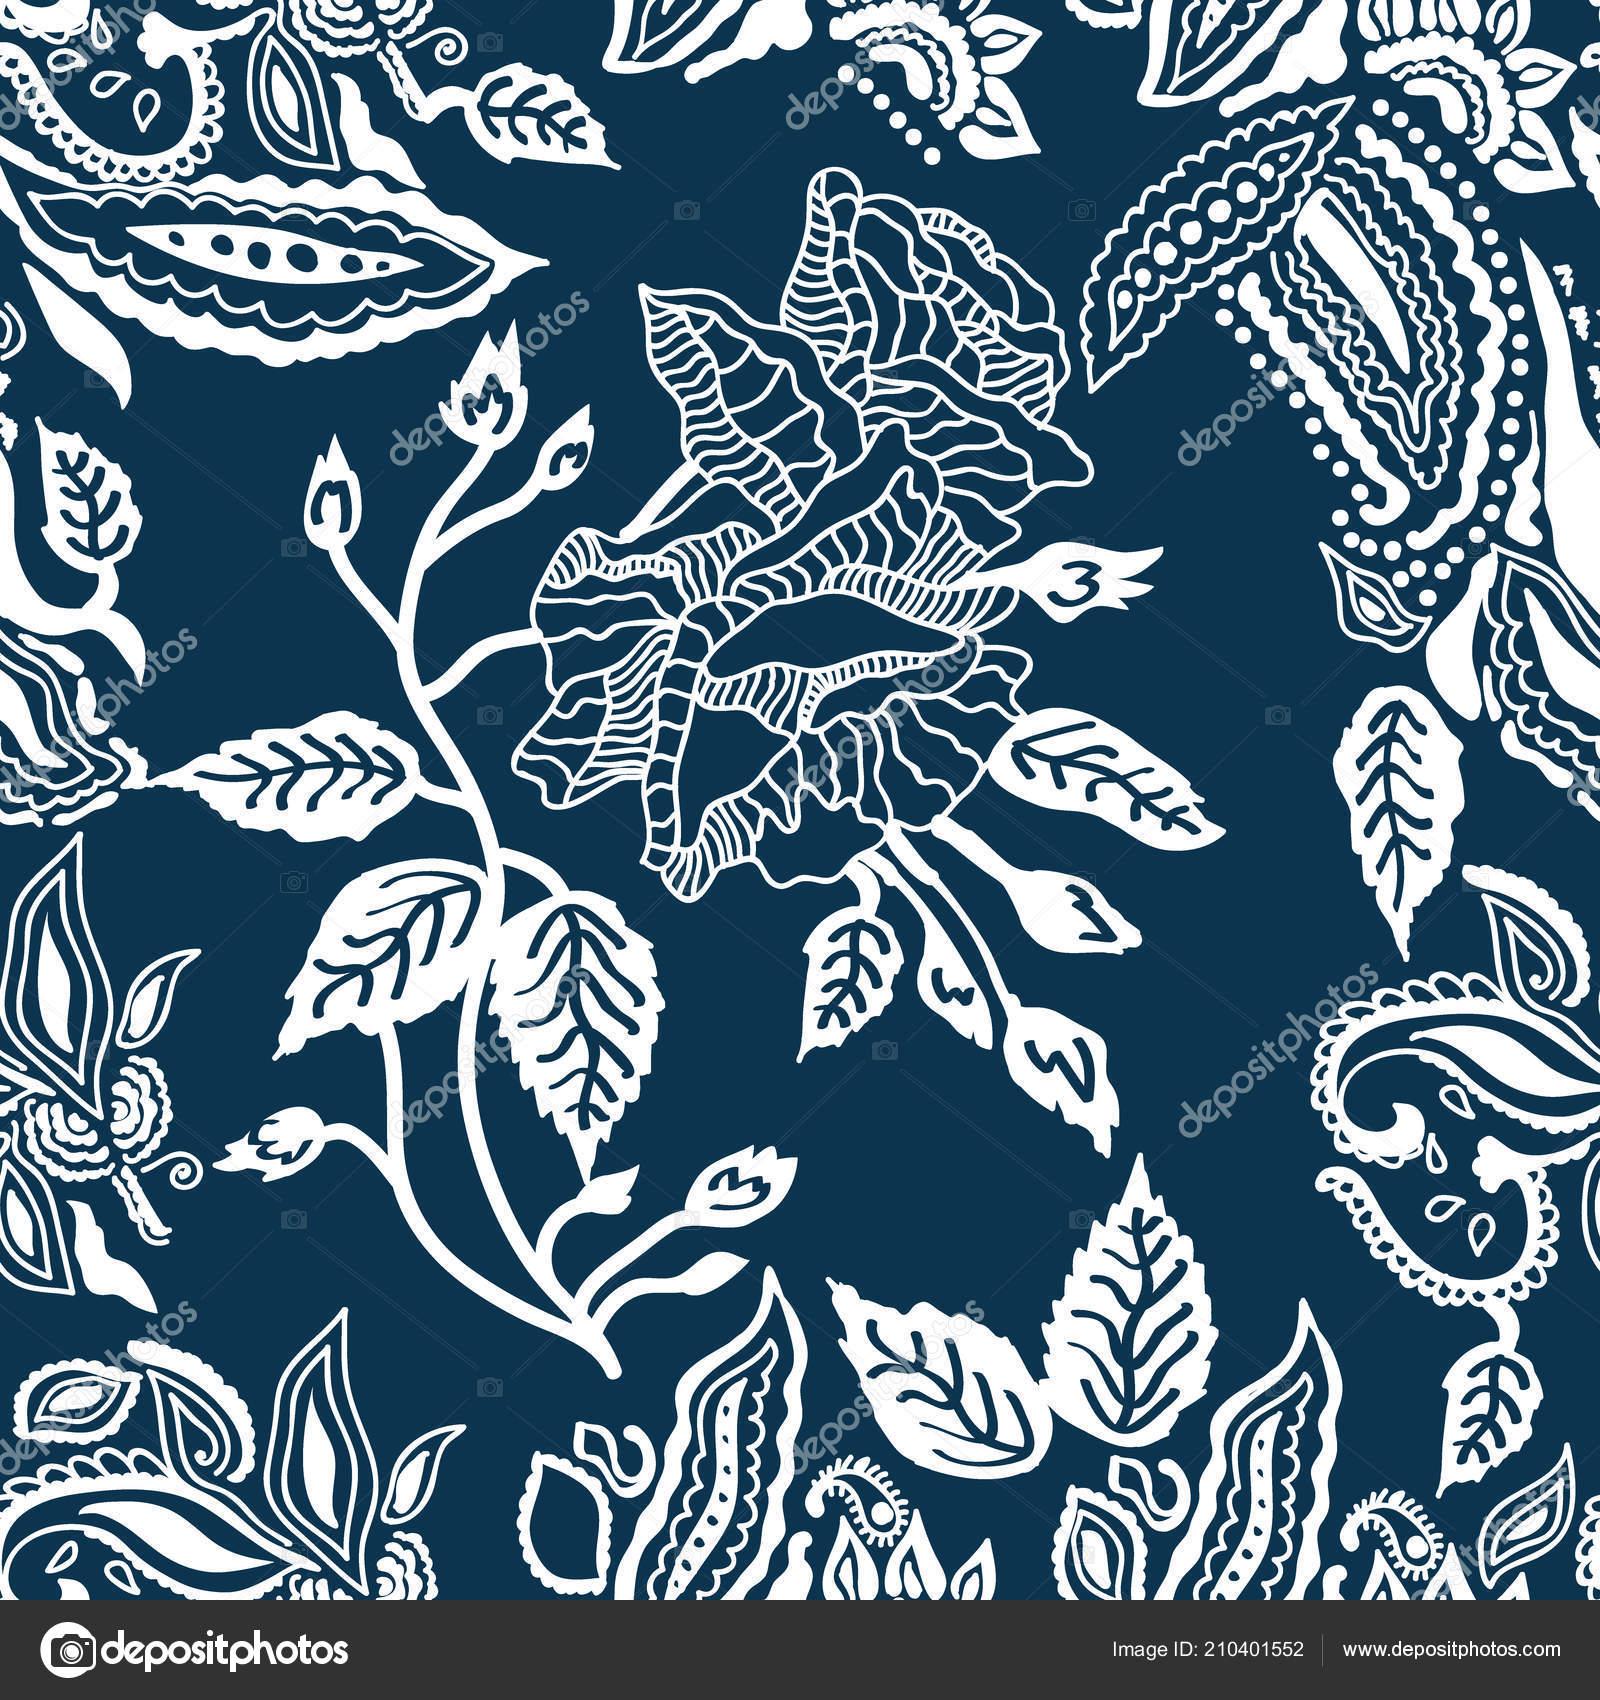 b1de1cecc376 Estampa floral azul e branca. — Vetores de Stock © SvetlanaKononova ...